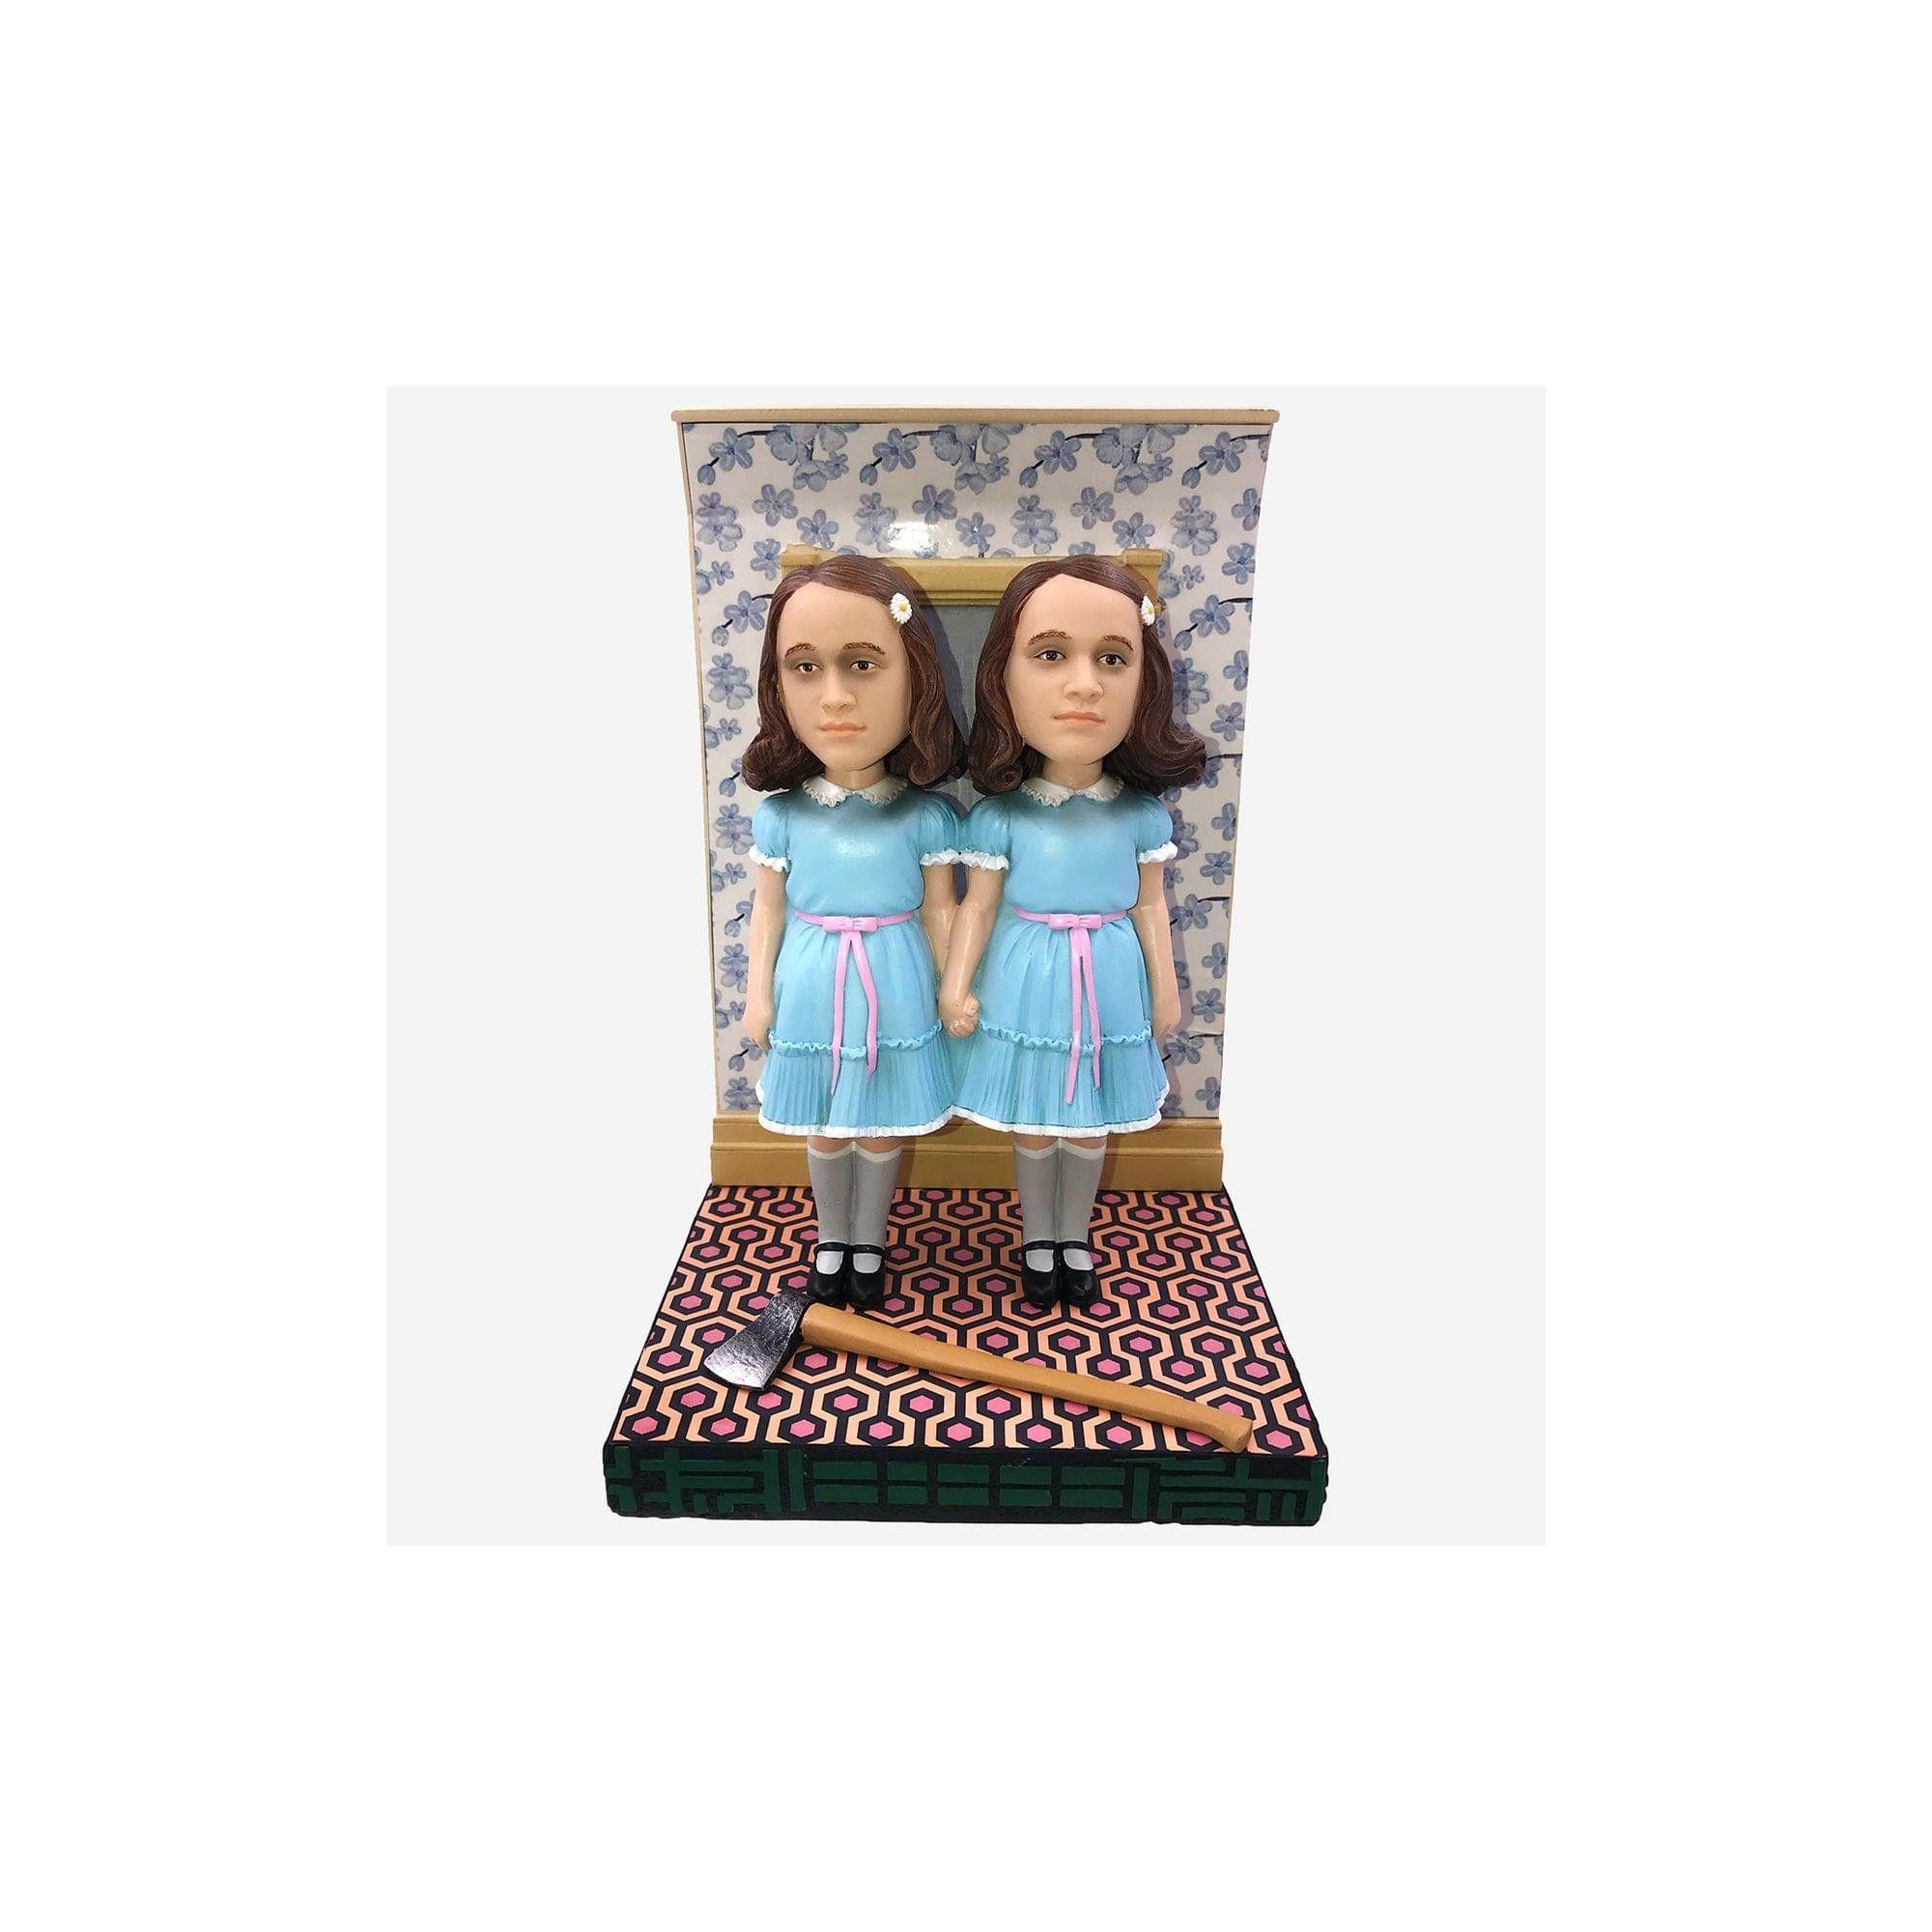 The Shining Twins Bobble Head